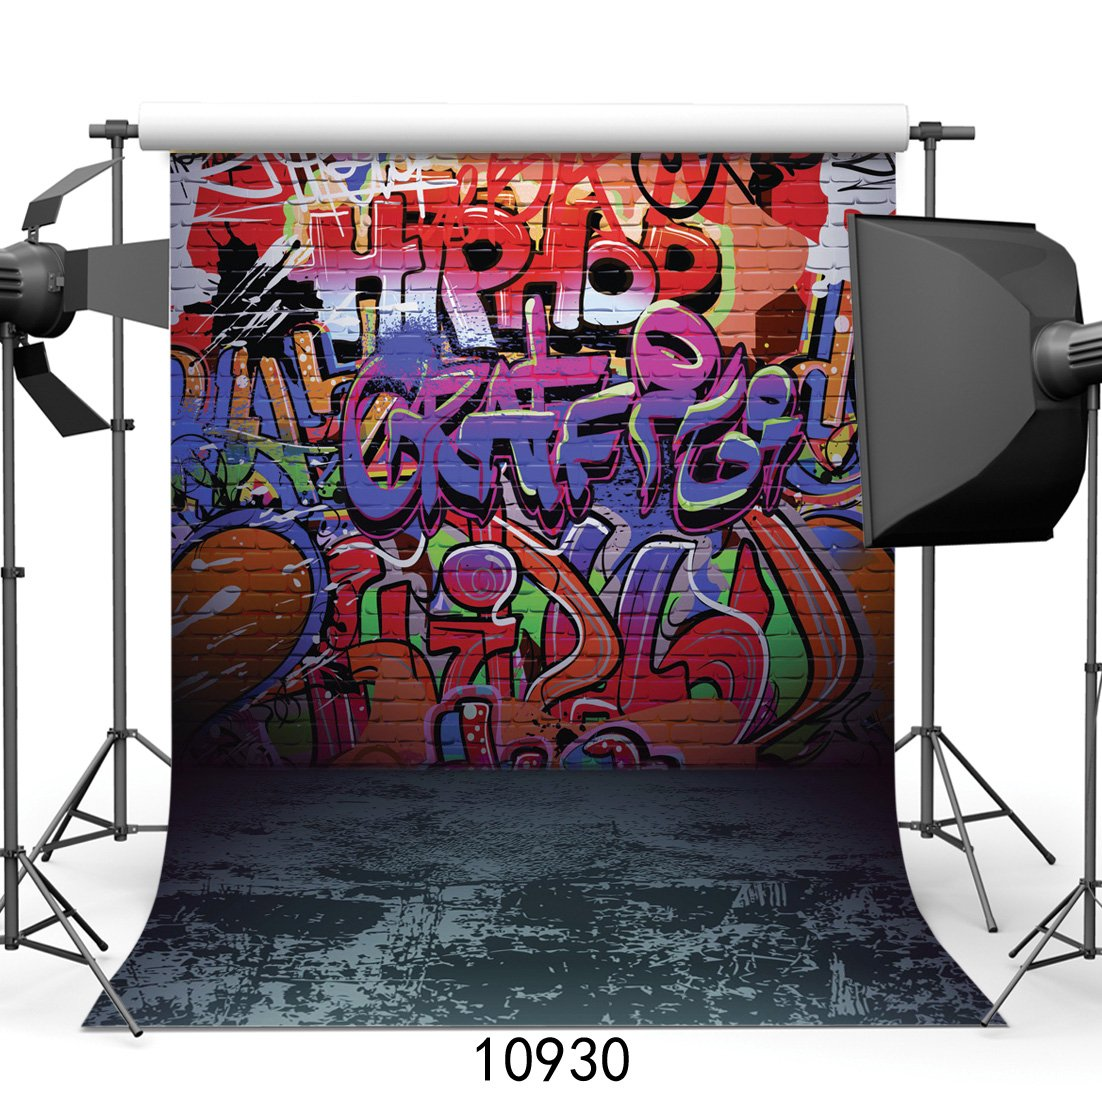 SJOLOON 5x7ft Graffiti Style Vinyl Photography Backdrop Customized Photo Background Studio Prop 10930